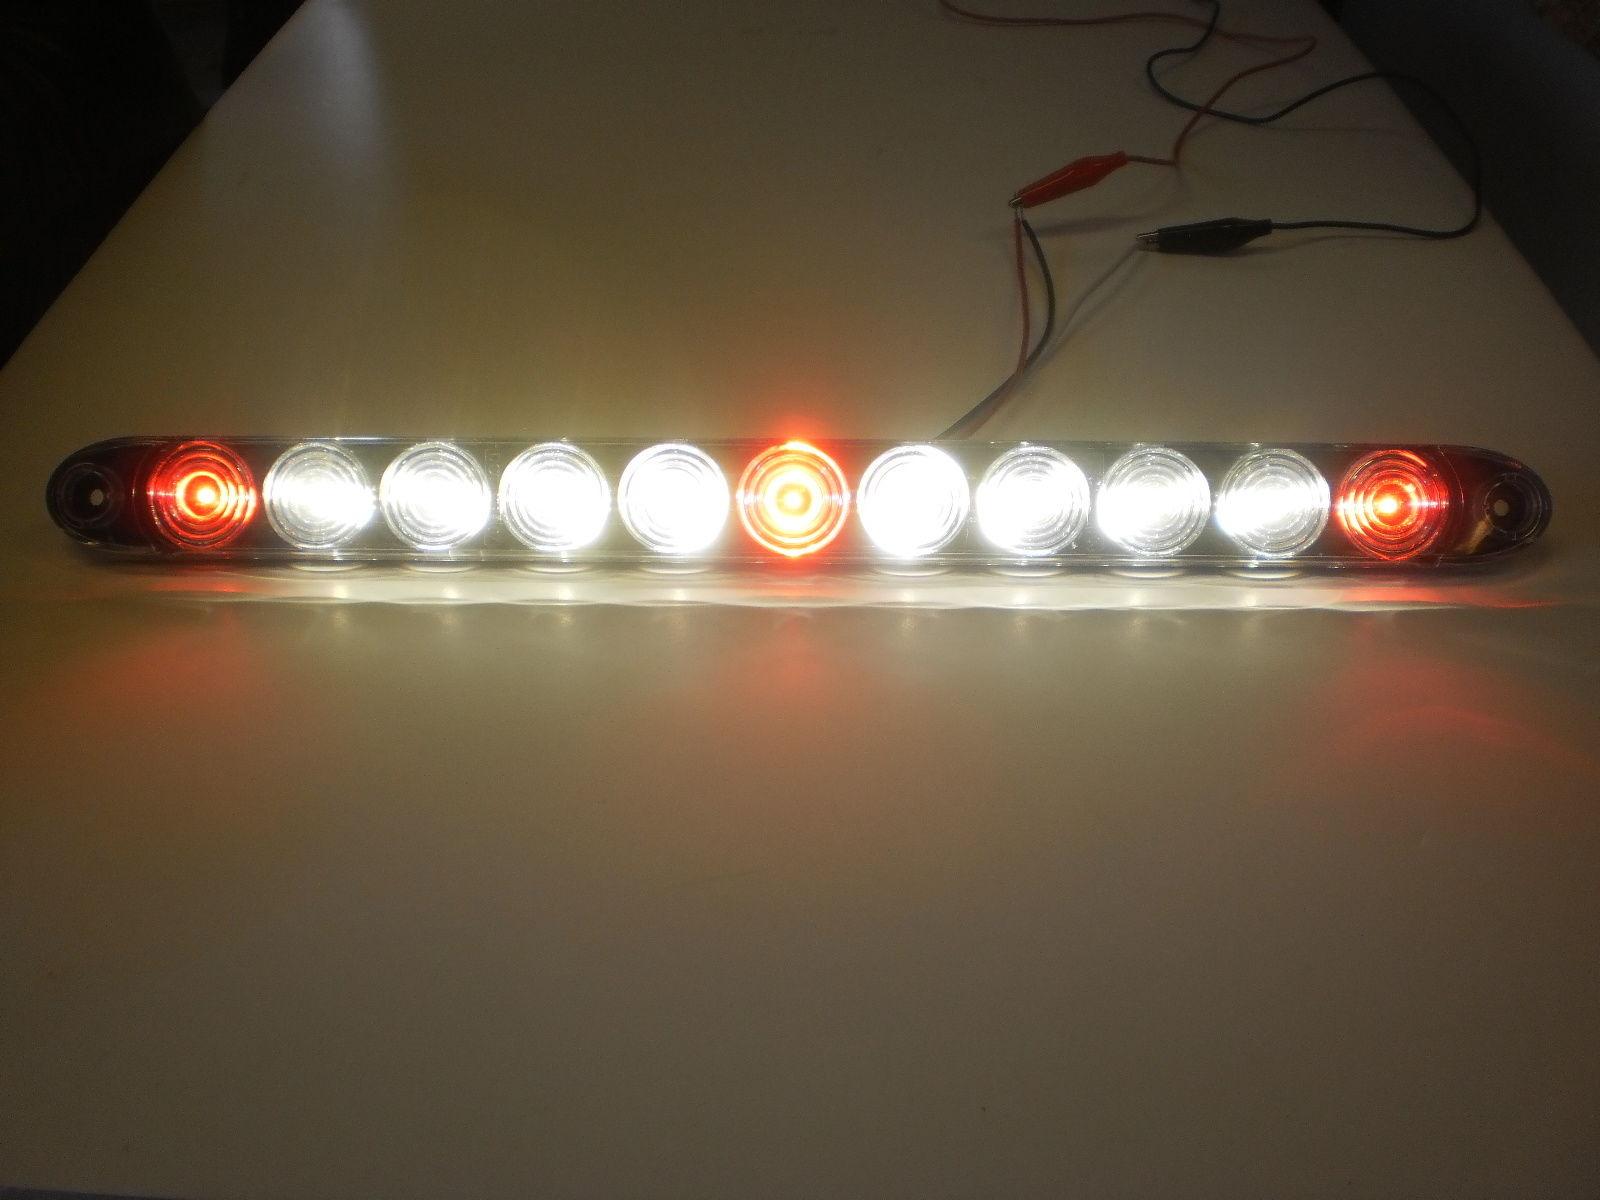 2 tecniq red 3 id bar w white reverse light 11 led 15 camper rh ebay com Lighting Techniques TecNiq Eon